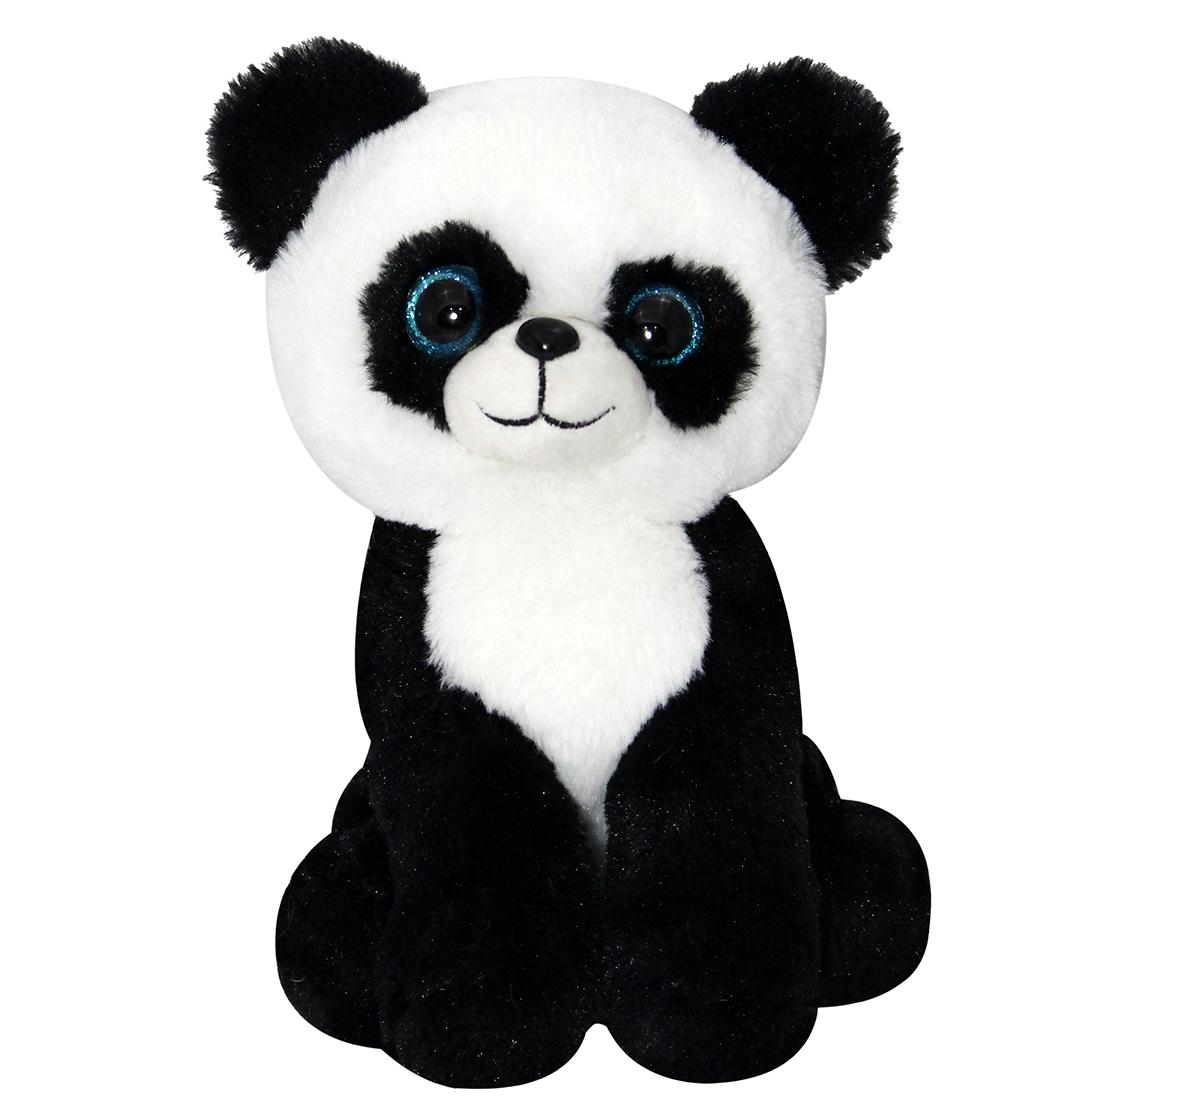 Soft Buddies | Soft Buddies Big Eyes Sitting Panda 30Cm, Unisex, 9M+ (Multicolor)